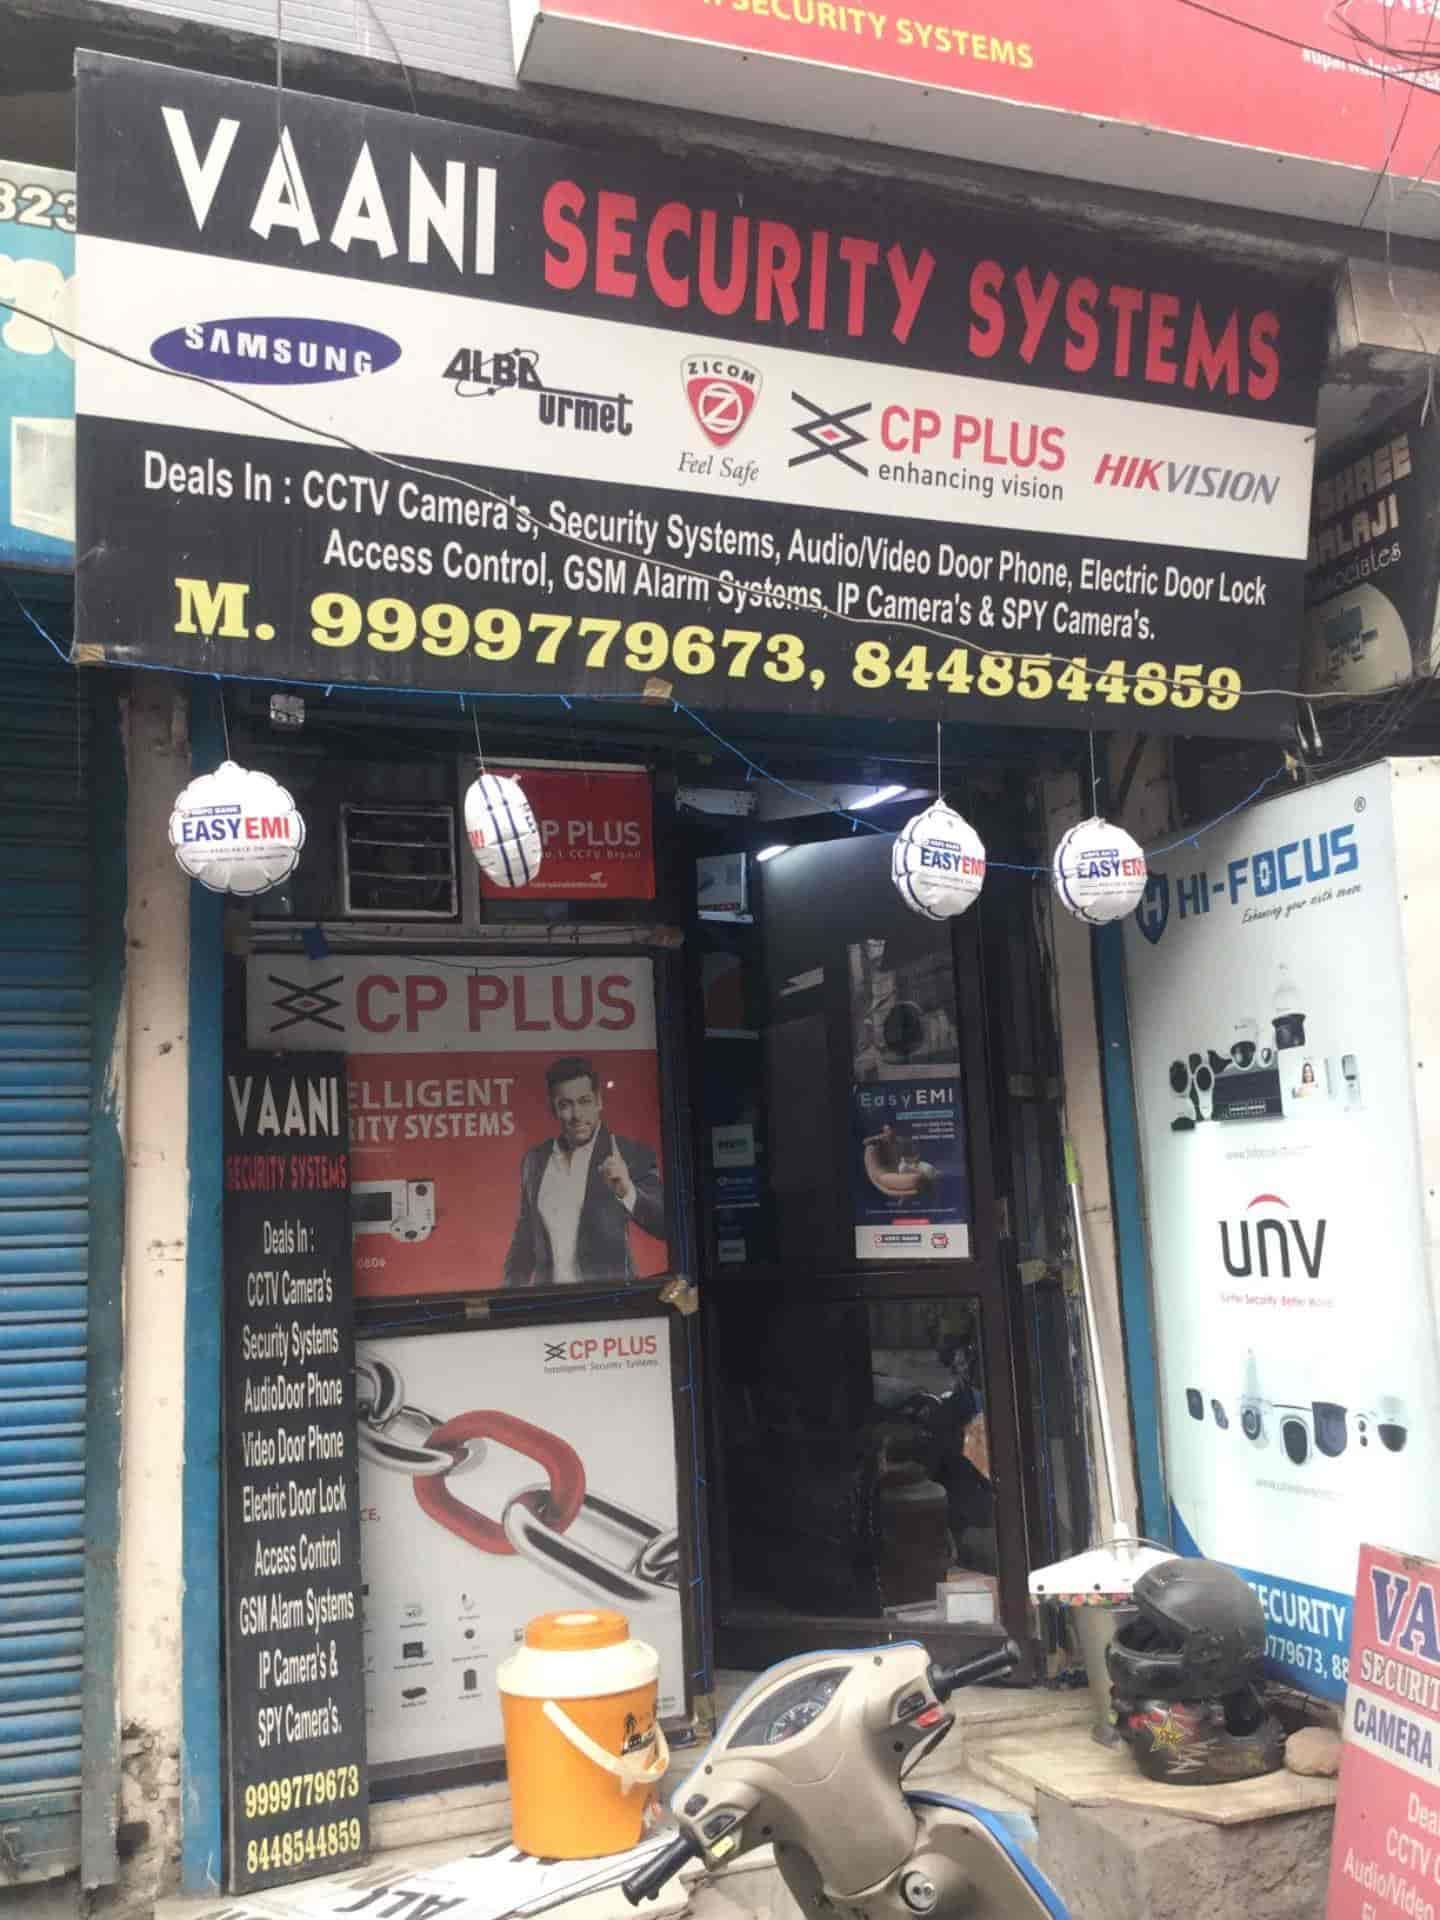 Vaani Security Systems, Krishna Nagar East - CCTV Dealers in